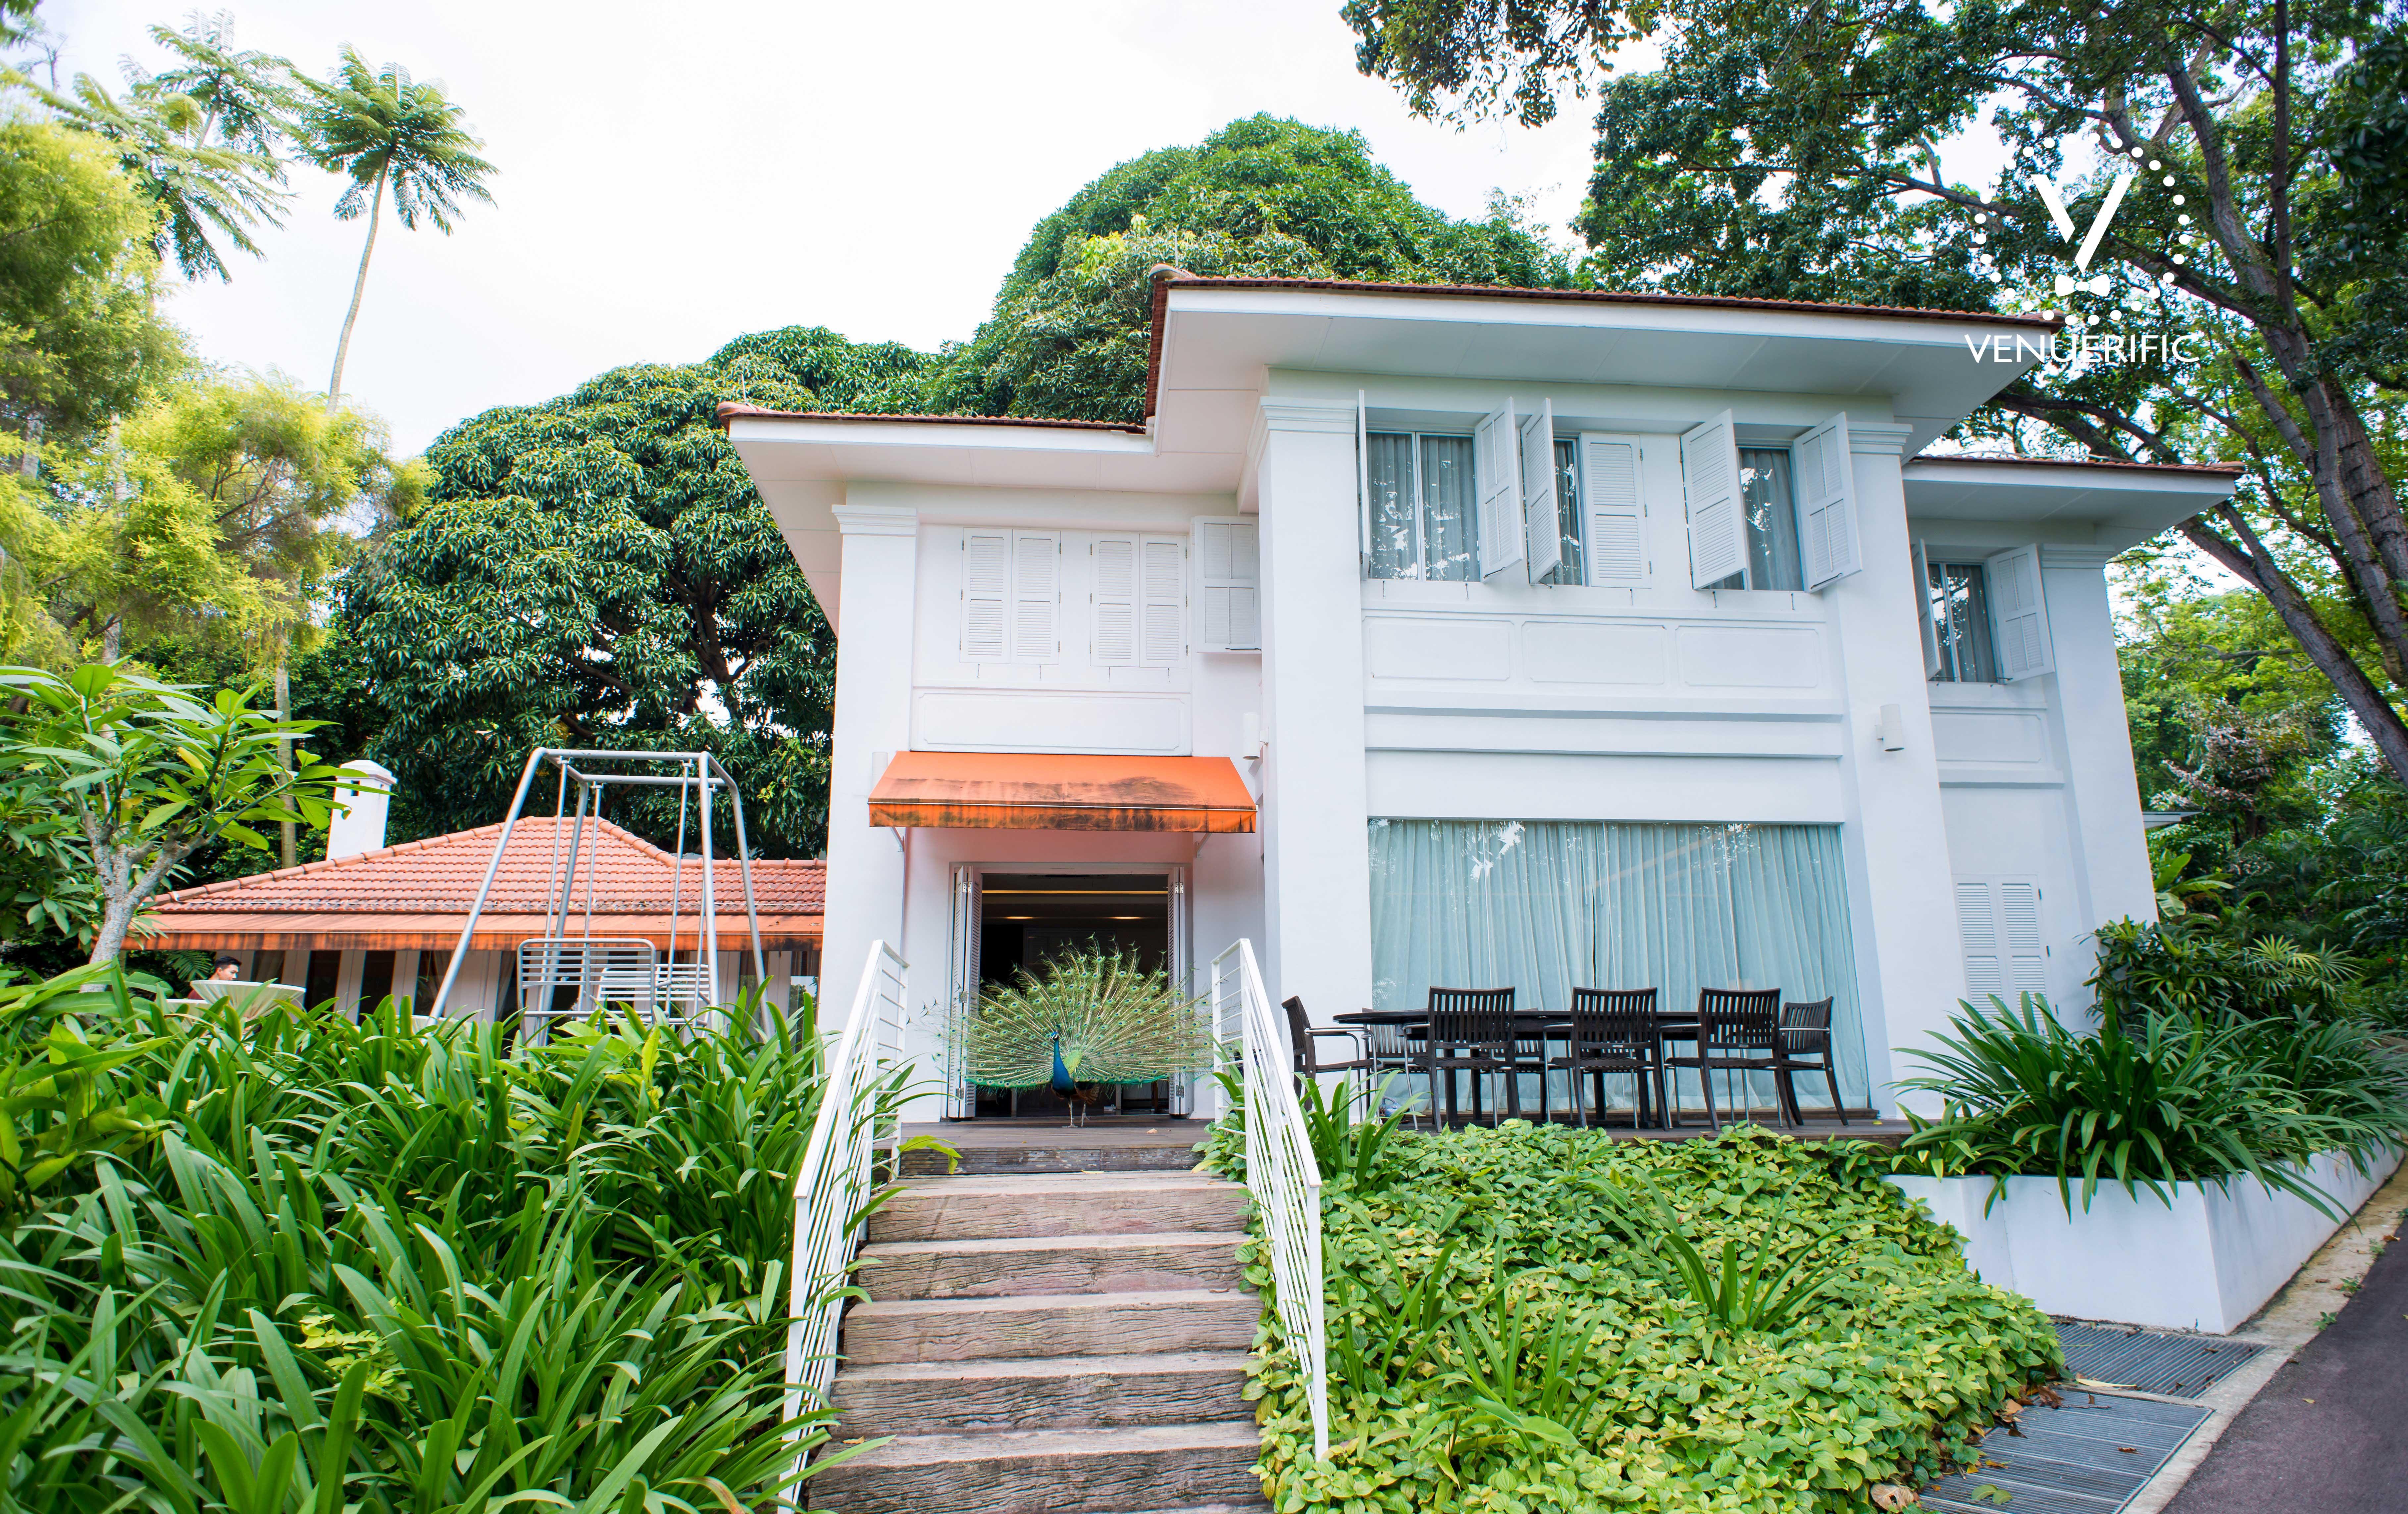 21st-birthday-party-venue-event-space-venuerific-larkhill-mansion-singapore